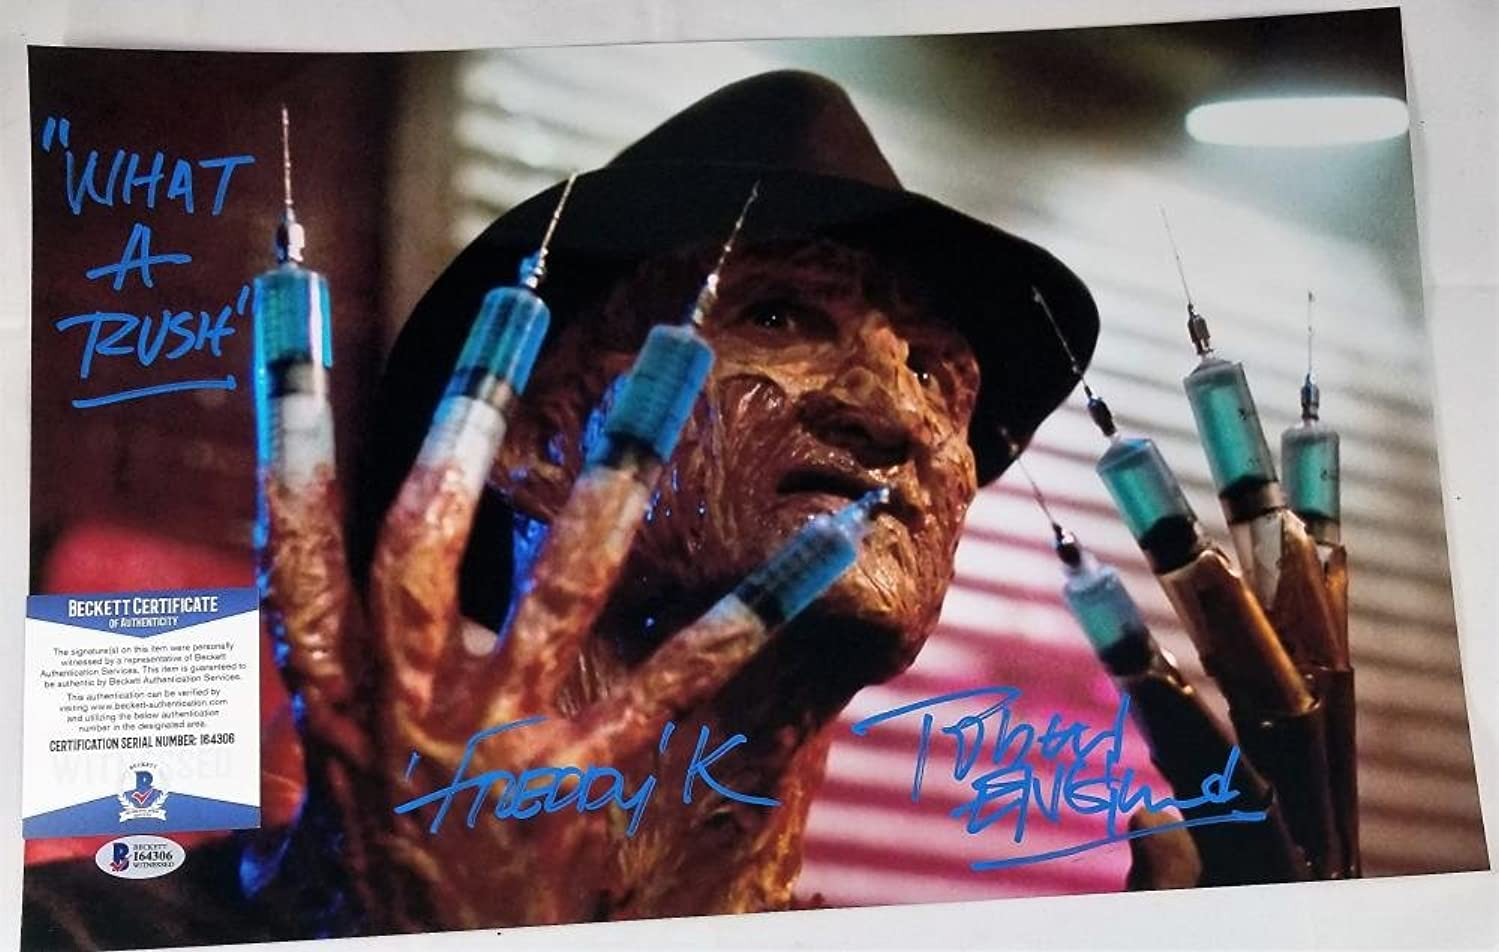 ROBERT ENGLUND FREDDY KRUEGER SIGNED METALLIC 11x17 PHOTO BAS COA 306